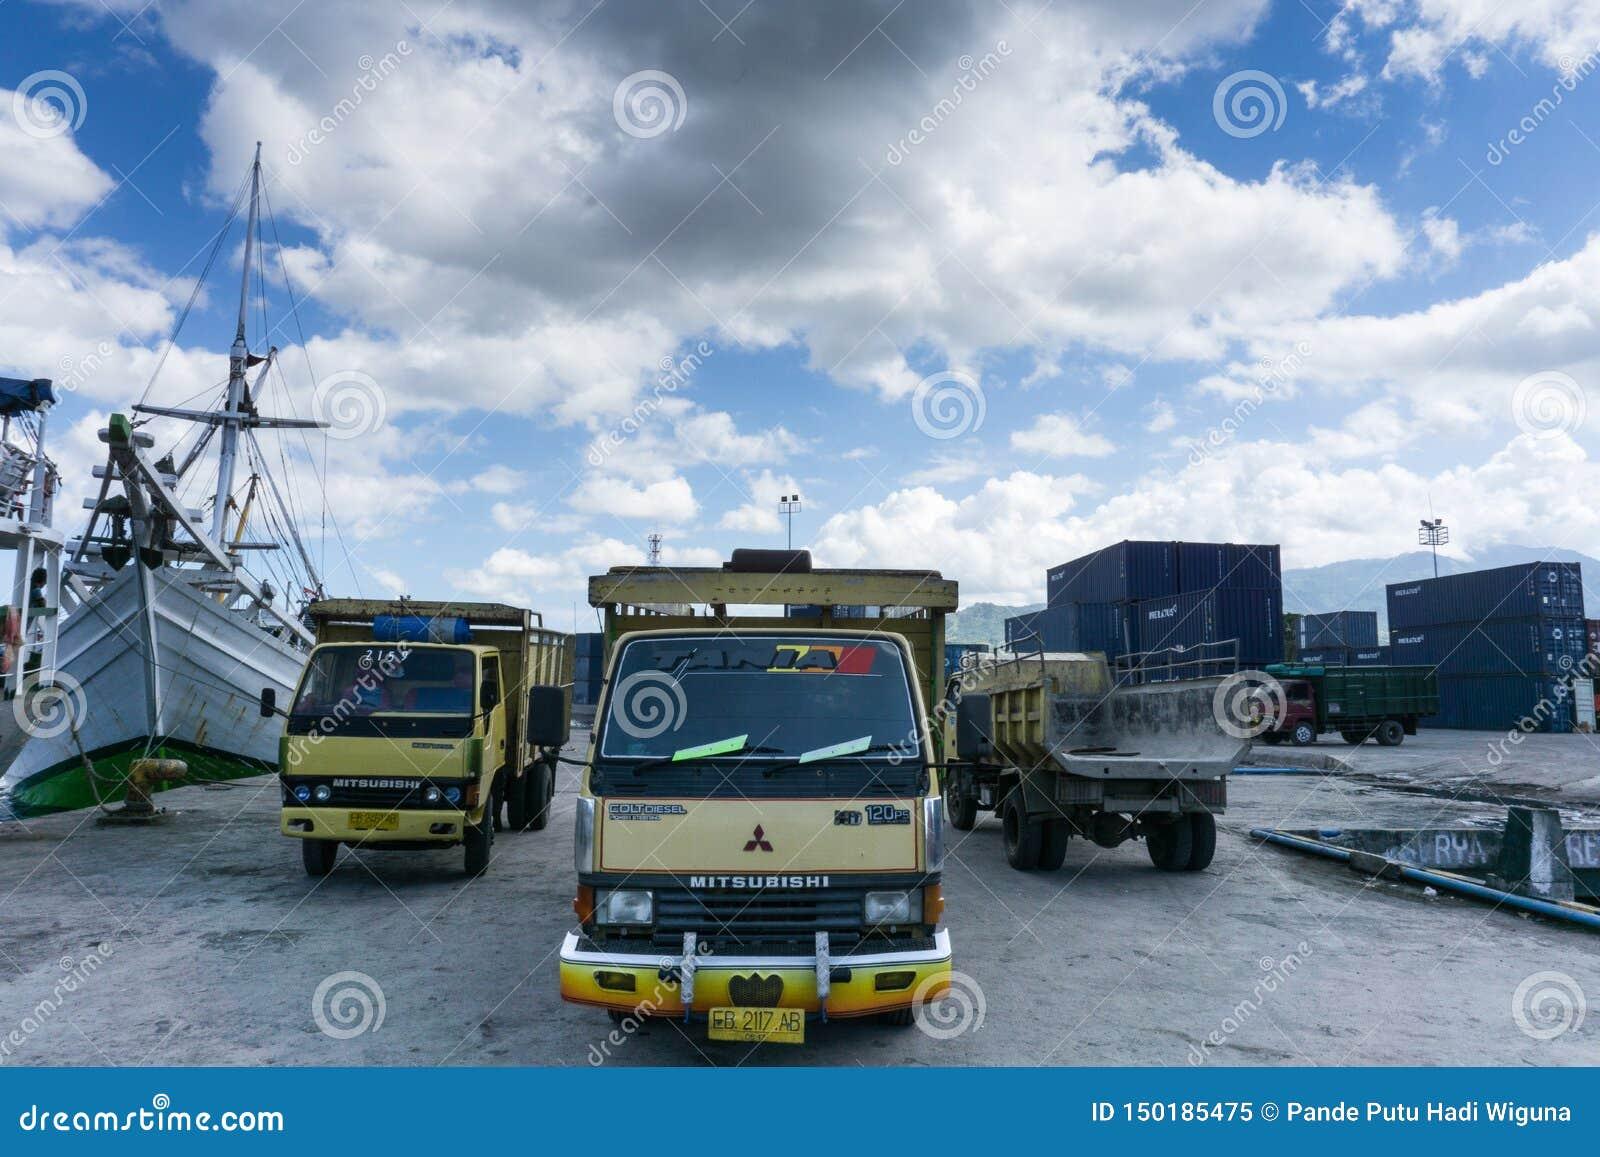 MAUMERE/INDONESIA-APRIL 28 2014年:运载物品的三辆卡车在港停放了毛梅雷在一个晴天,等待